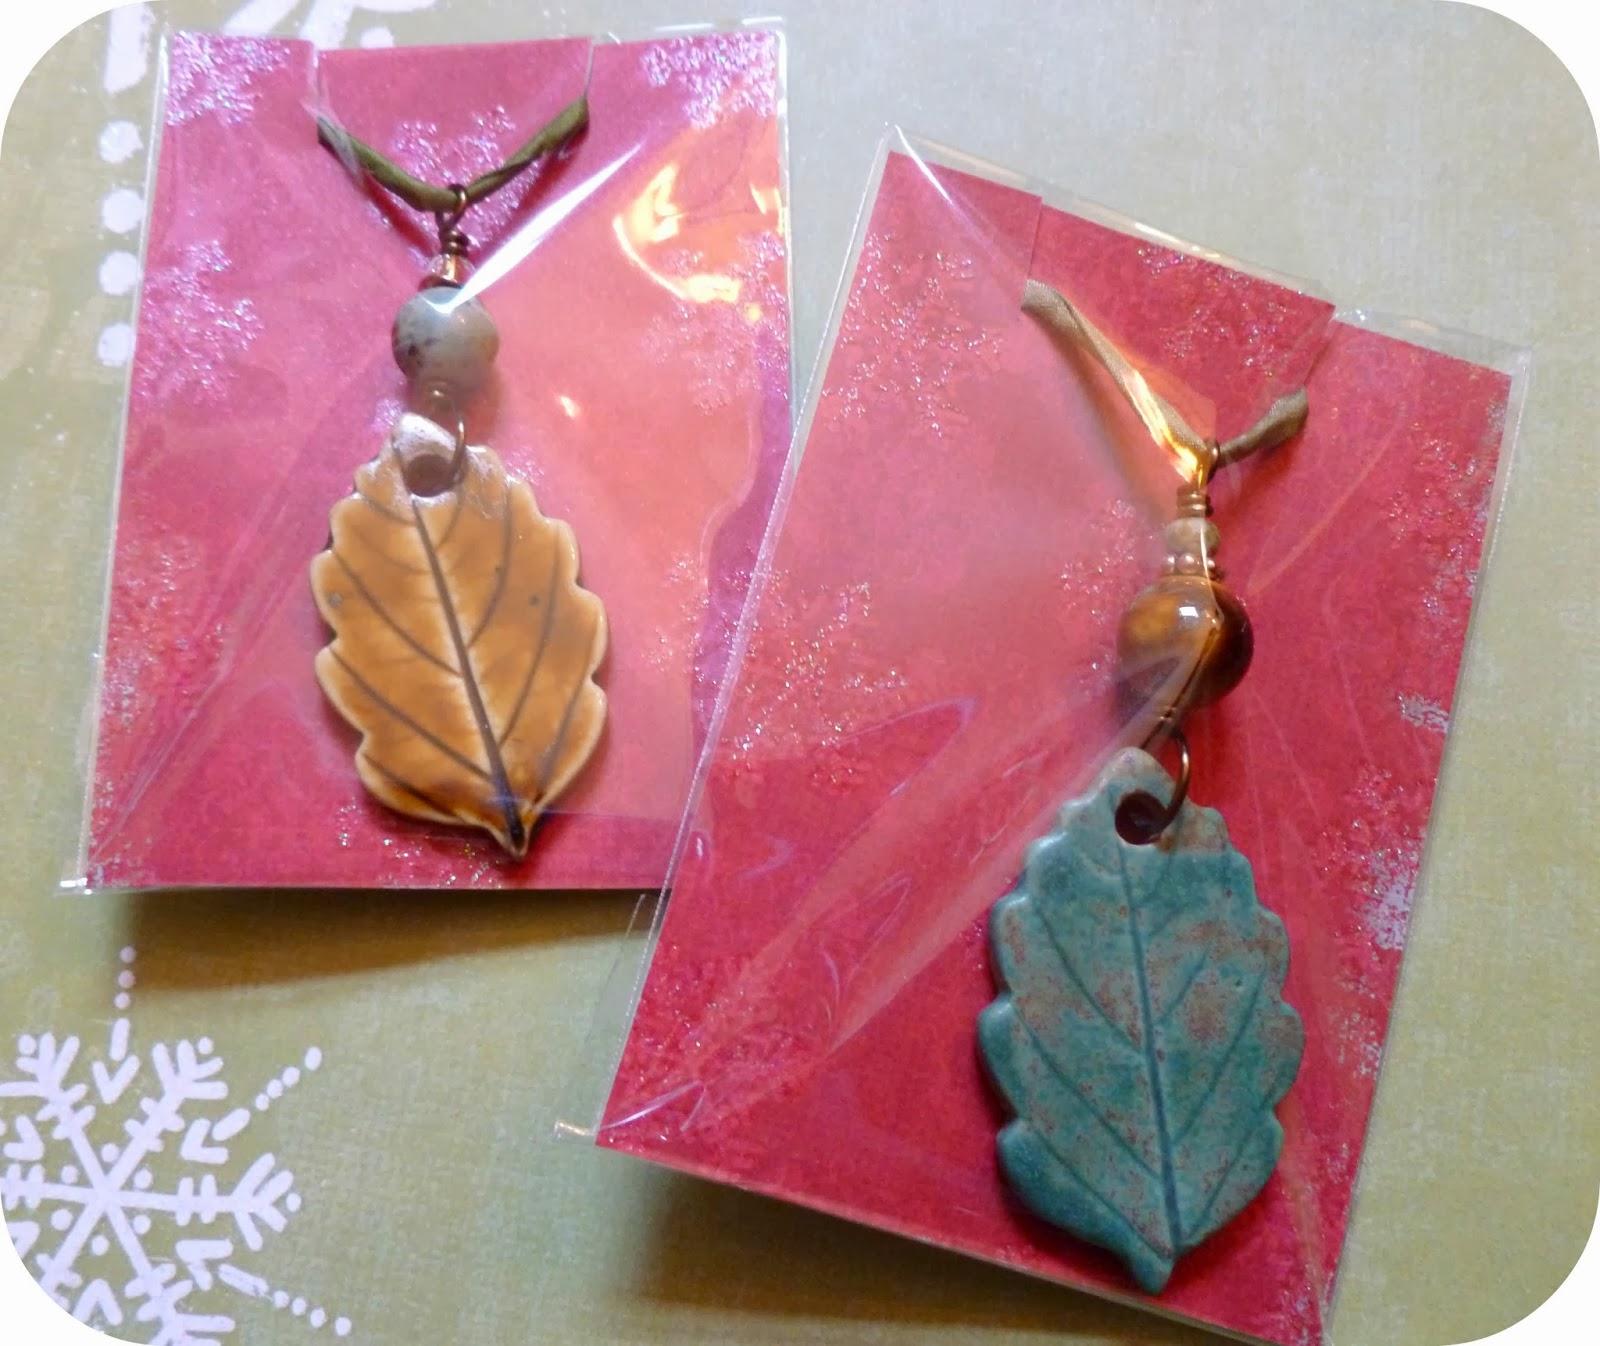 Art jewelry elements cute minimalist gift wrapping for Minimal art jewelry